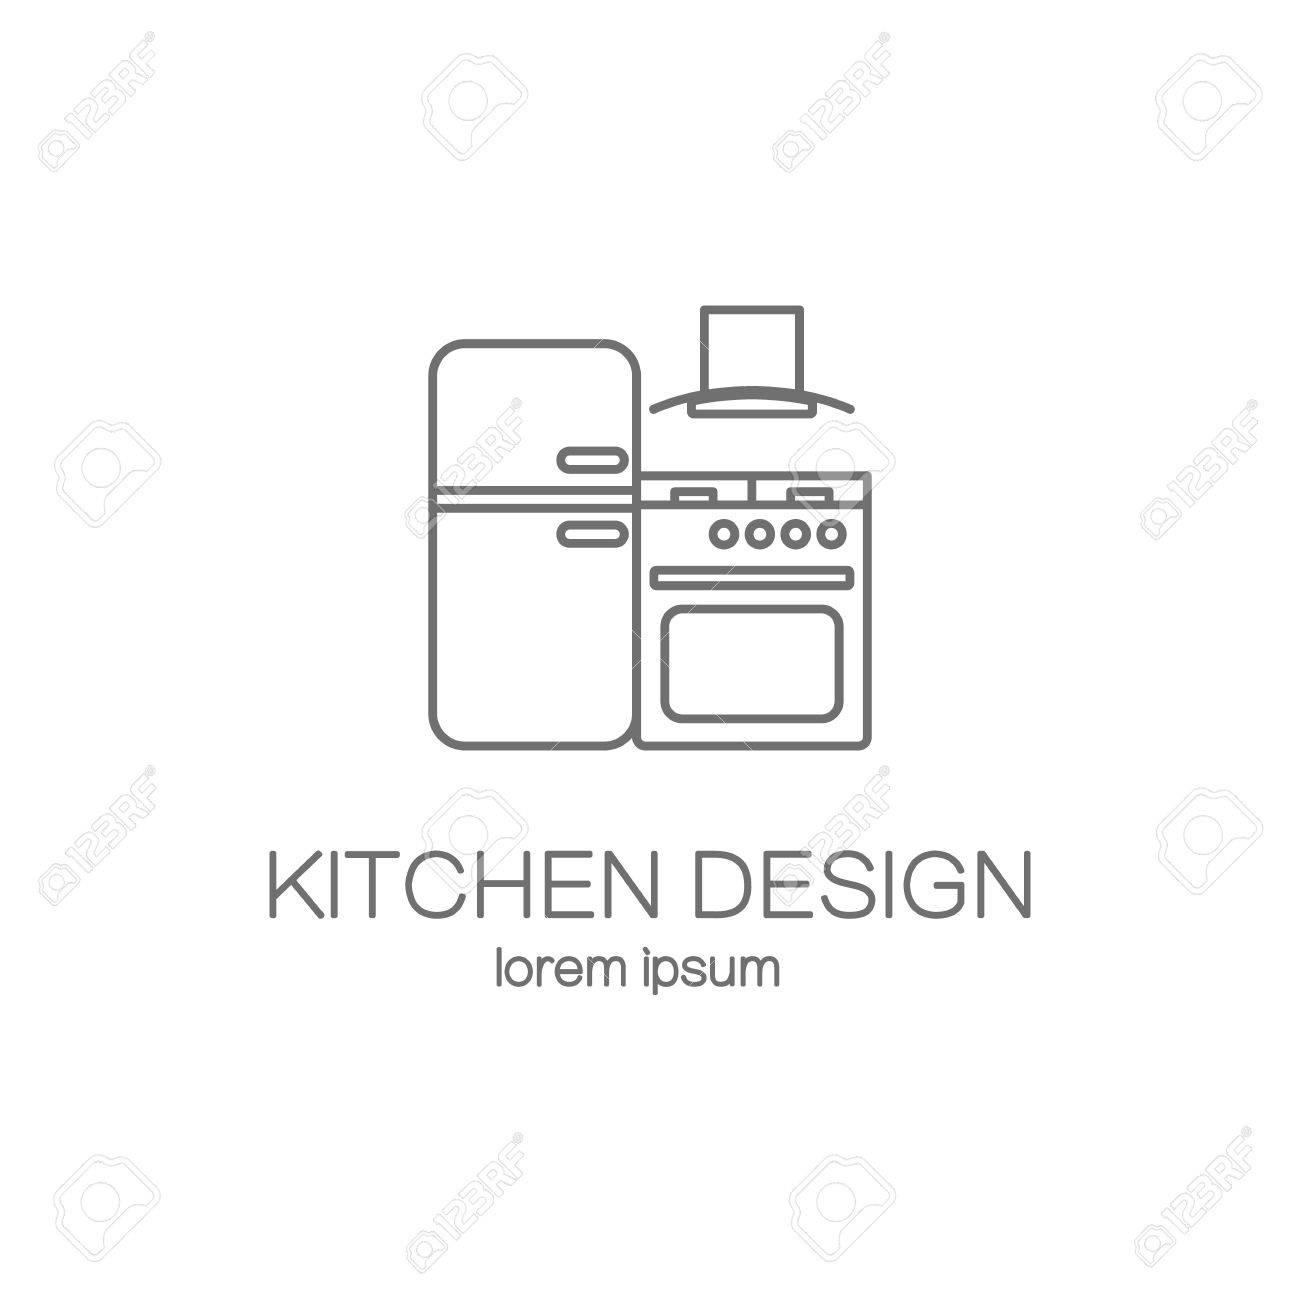 kitchen design line icon web logotype design templates modern